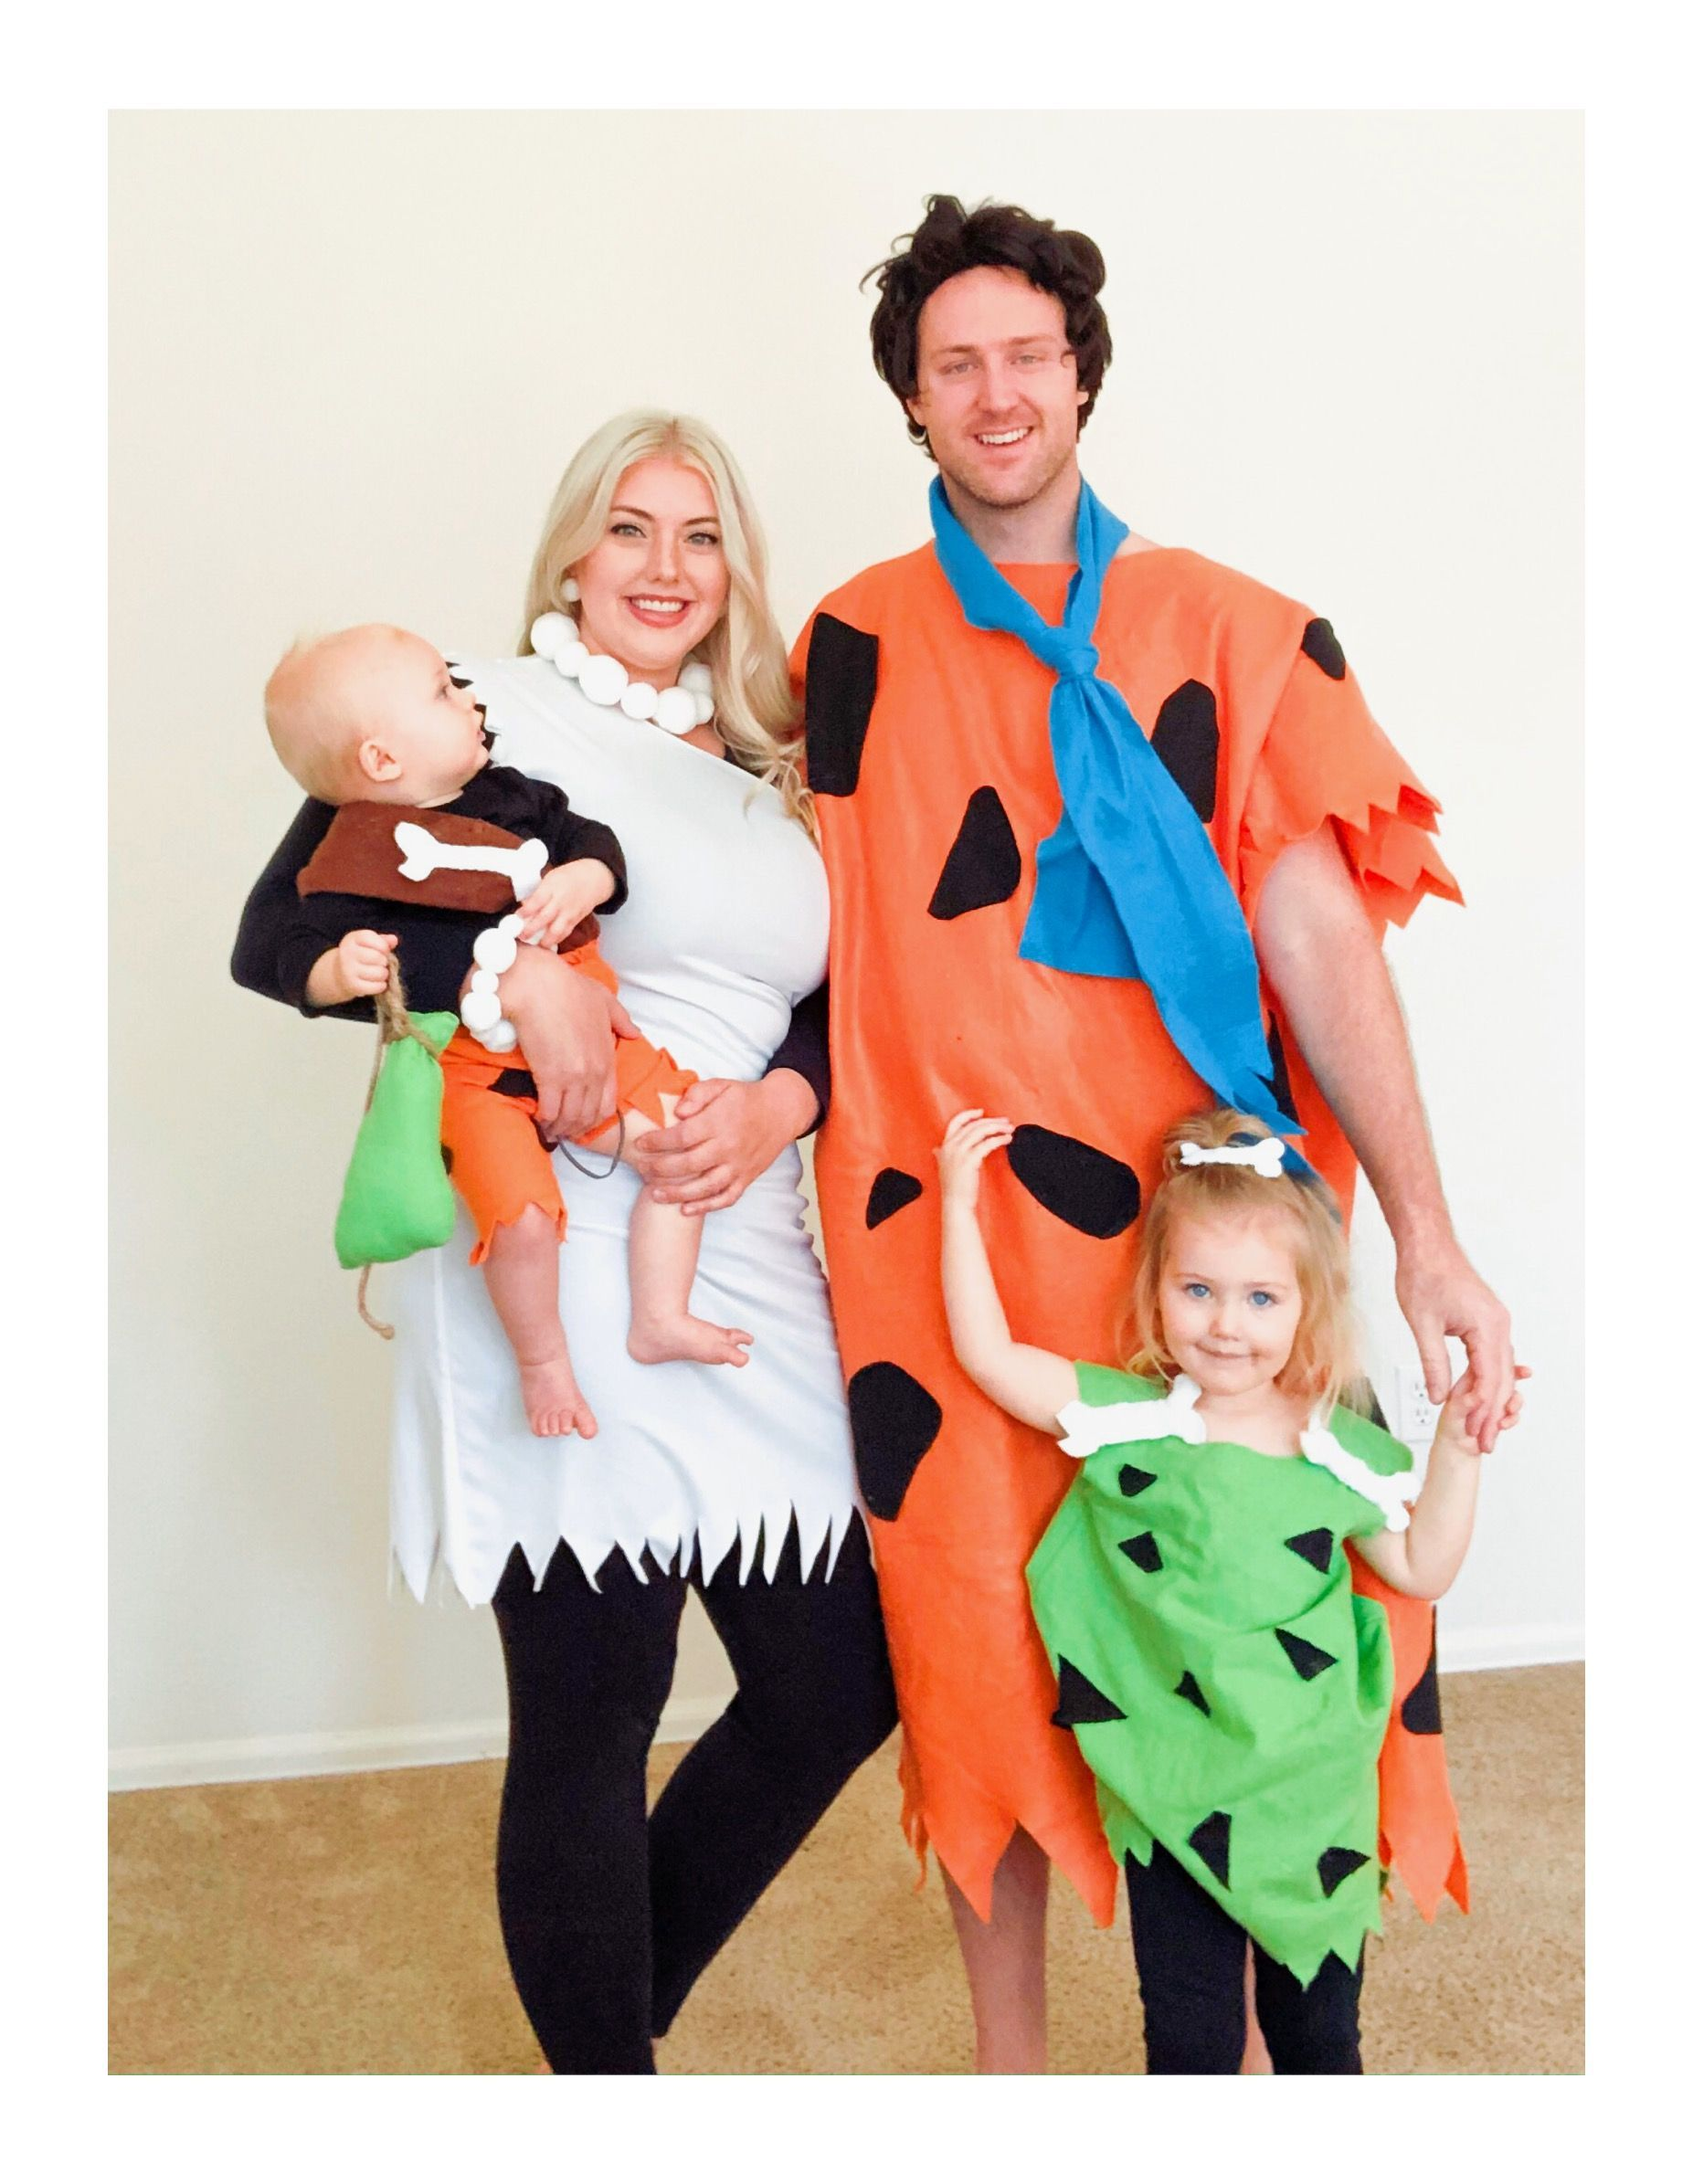 Flintstone costumes-family costumes -pebbles costume-bam bam costume #pebblesandbambamcostumes Handmade costumes Halloween #pebblescostume